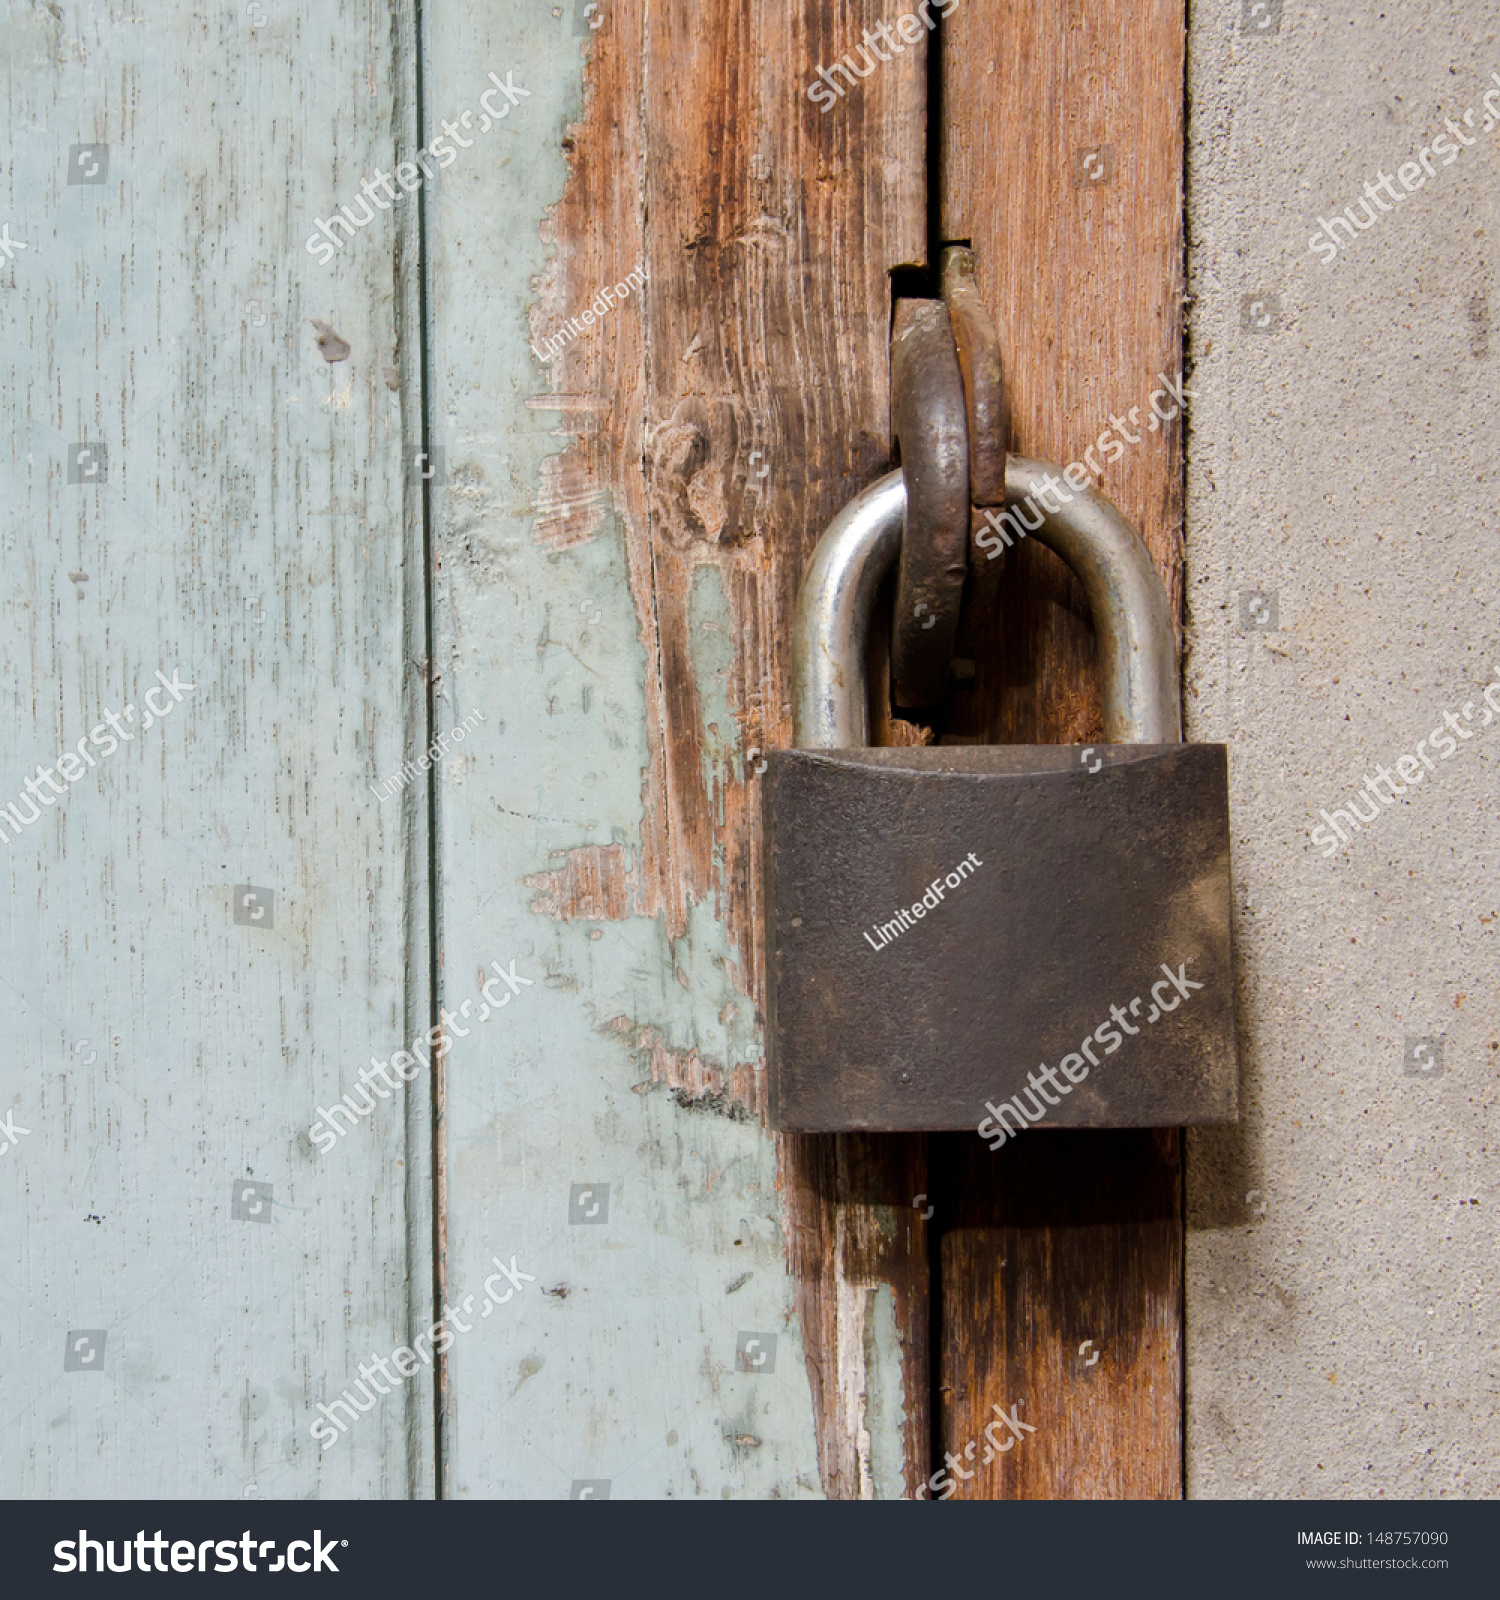 Metal Rusty Padlock On Old Wooden Stock Photo 148757090 - Shutterstock